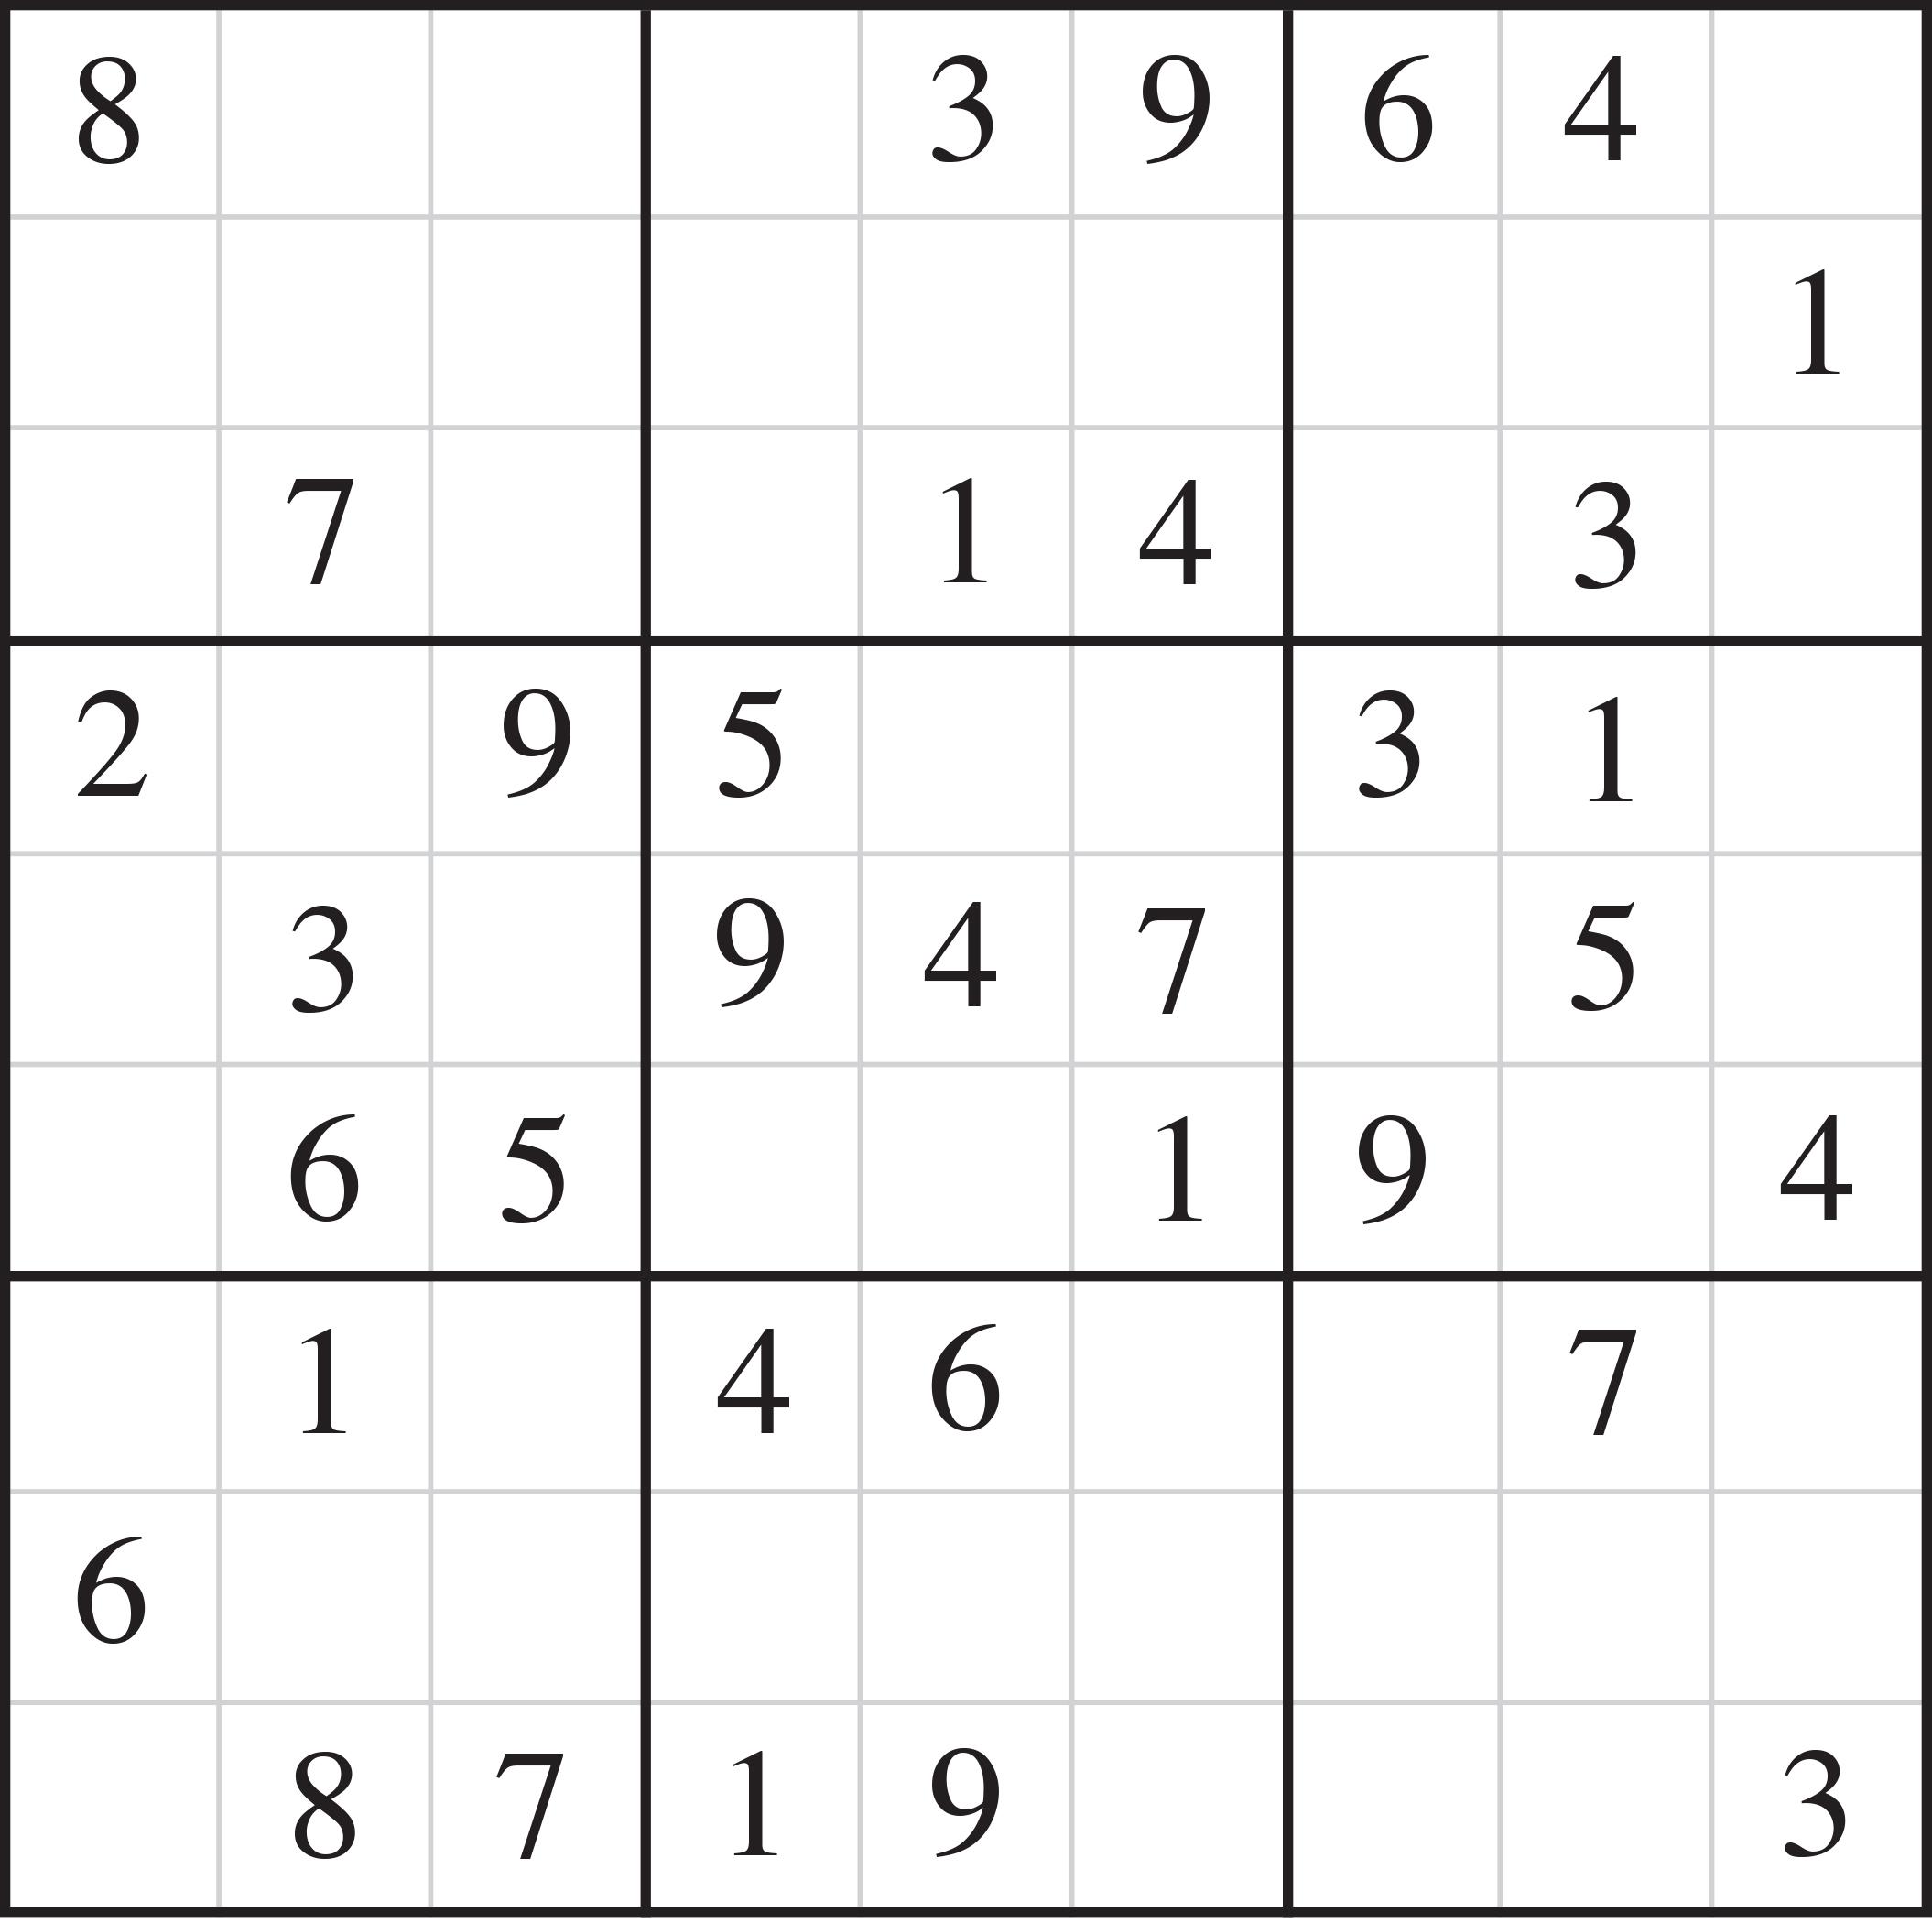 Puzzle Archive - Clue Search Puzzles